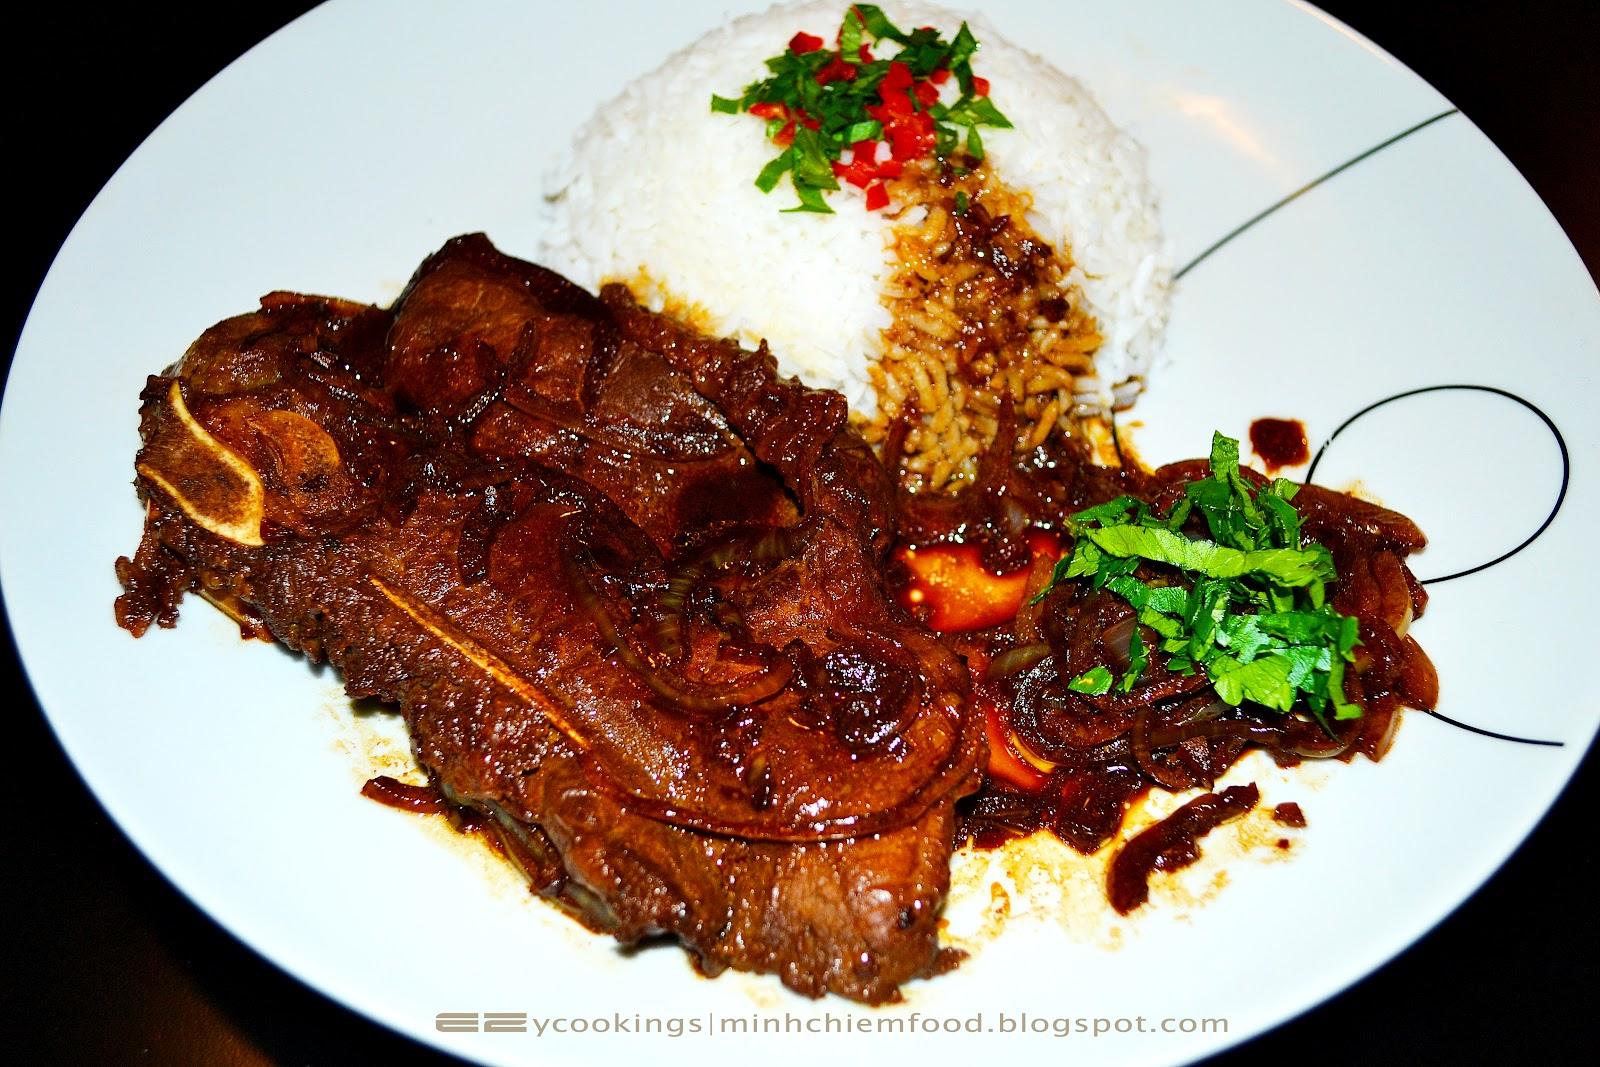 Easy Cooking: Filipino T-bone Steak